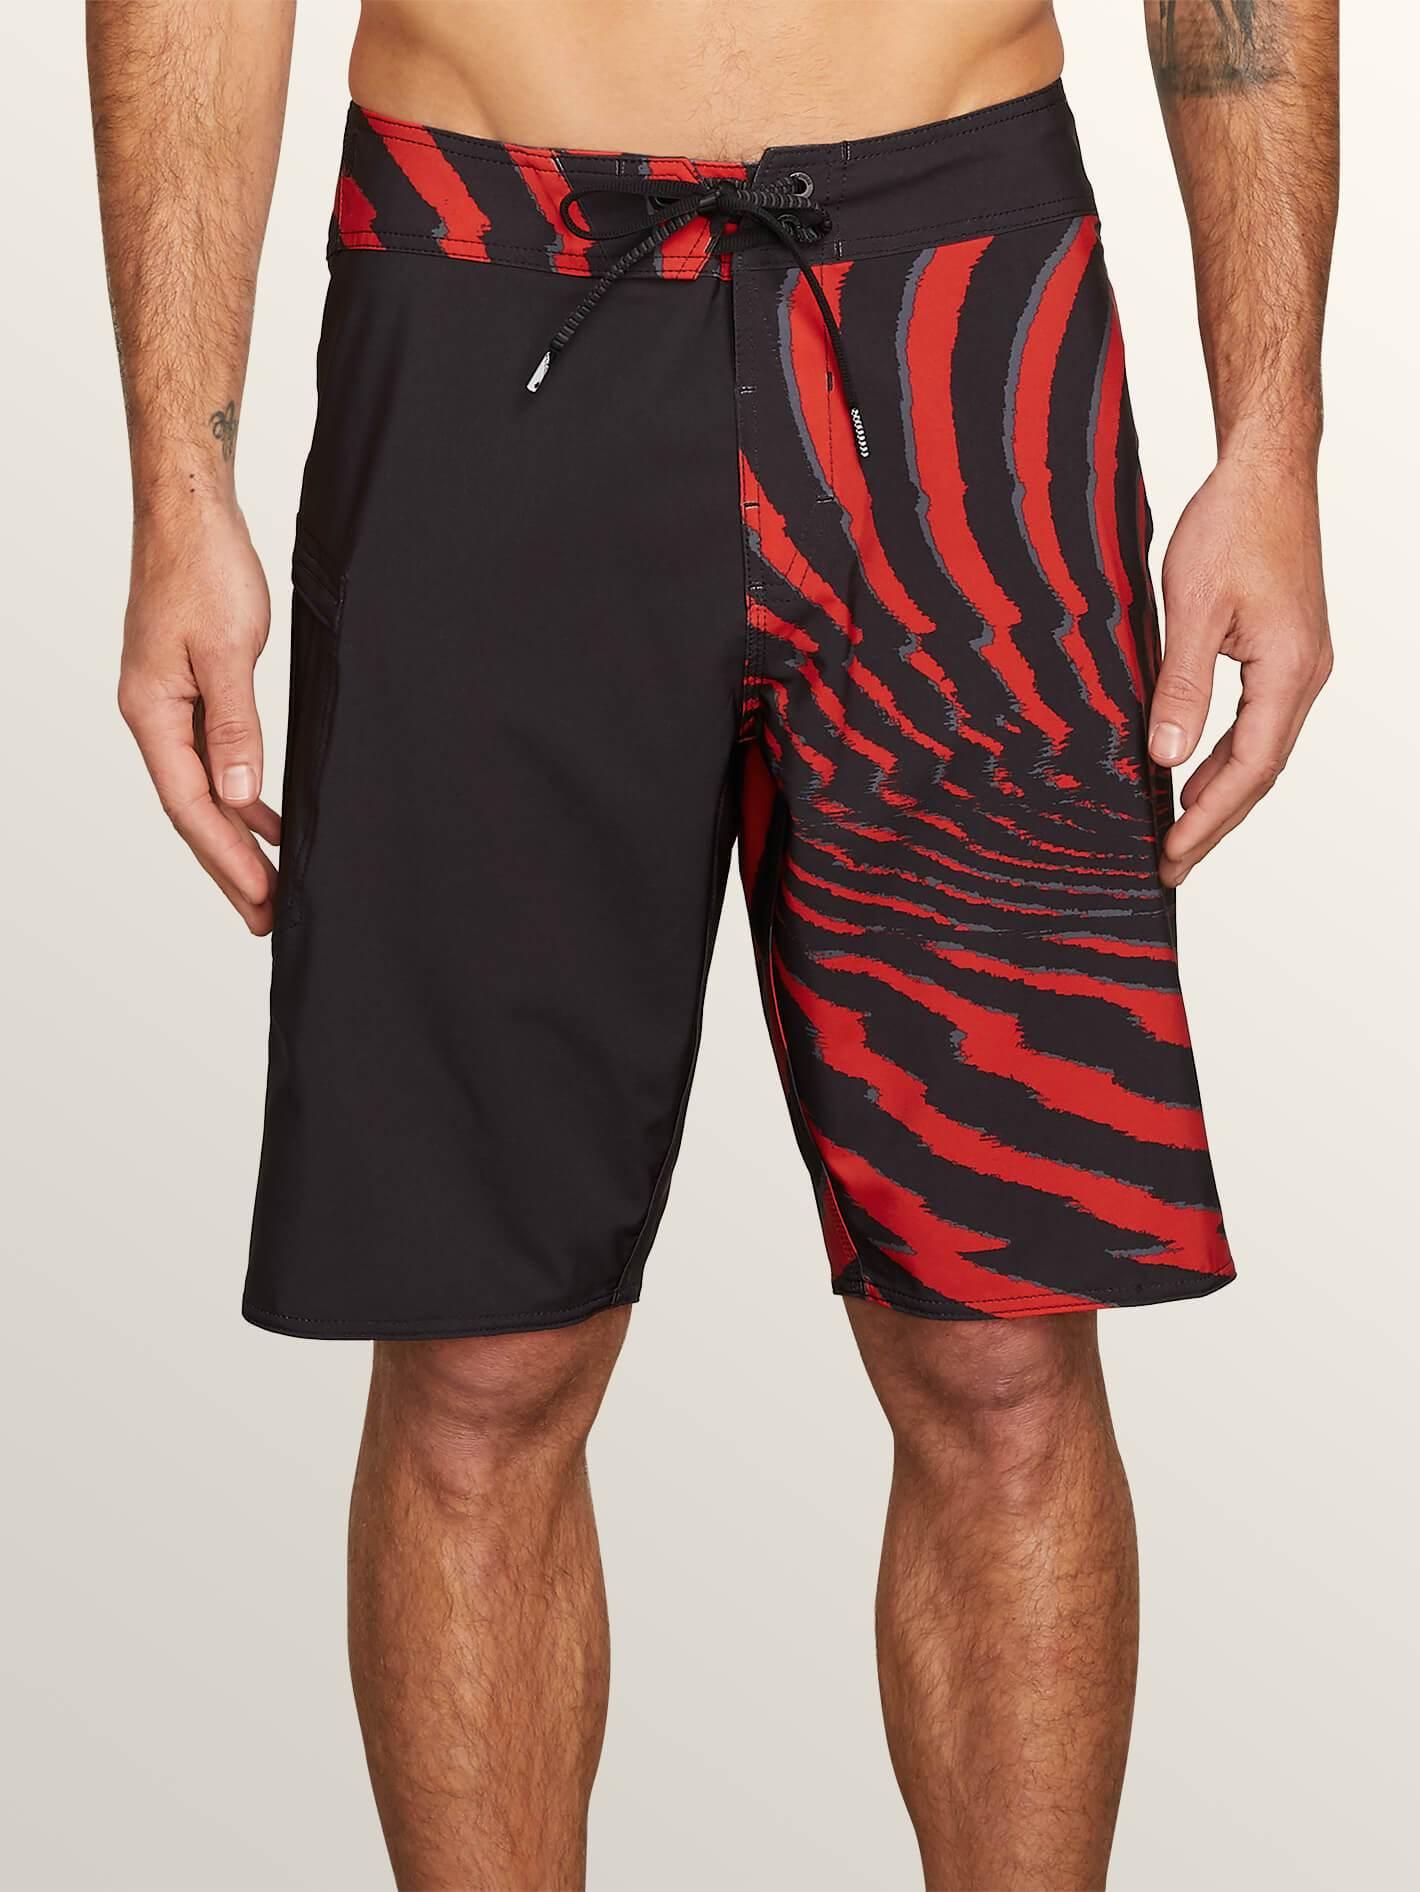 de4fd2d5da Lido Block Mod Boardshorts in 2019 | Products | Surf shorts, Surf ...